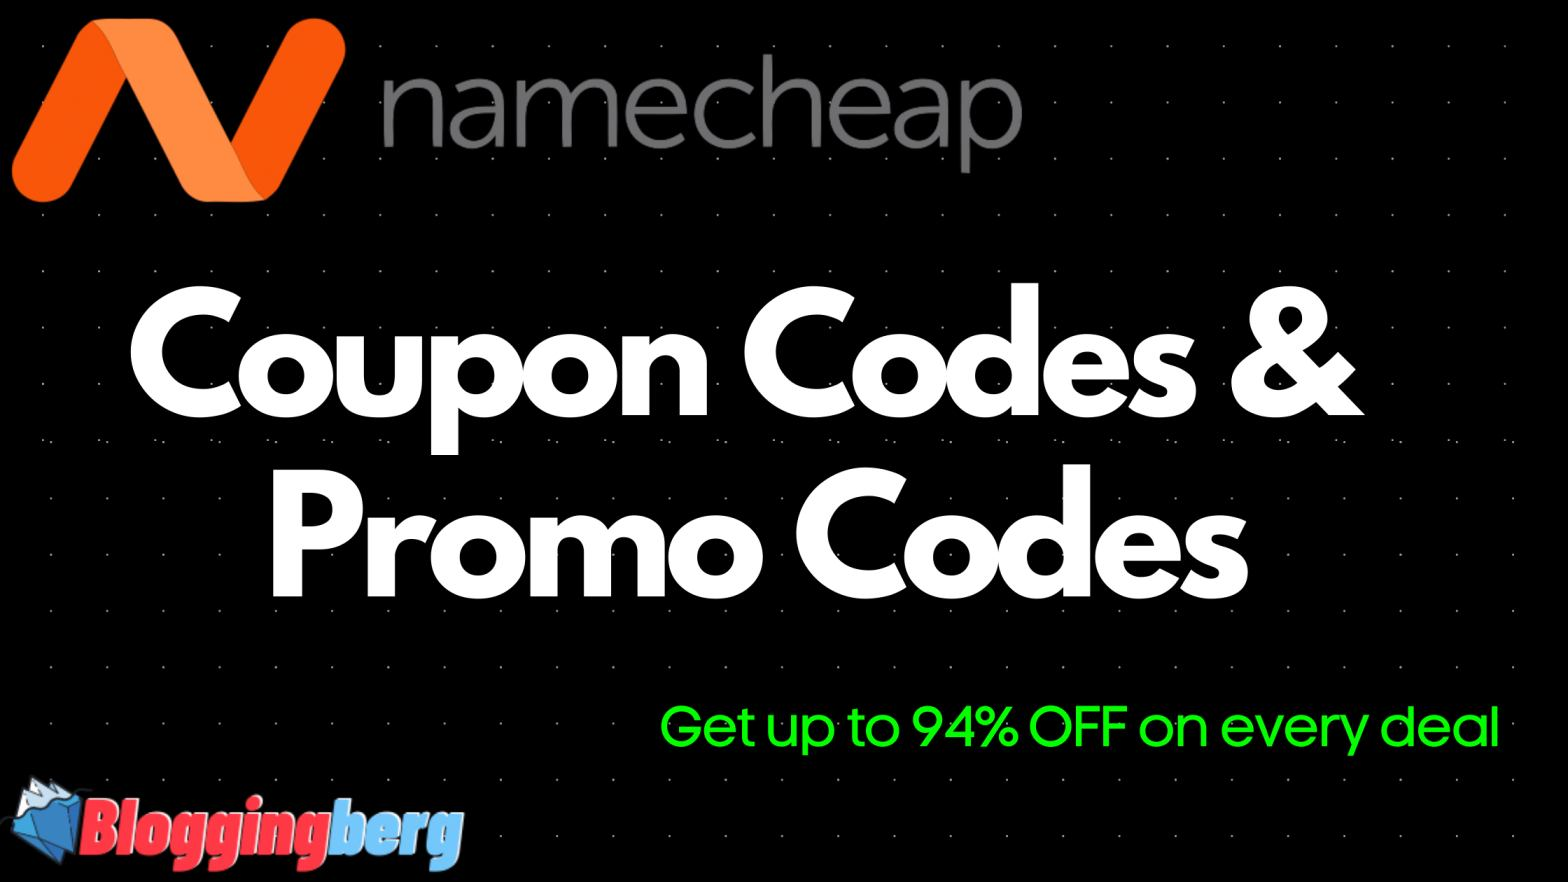 namecheap coupon & namecheap promo code